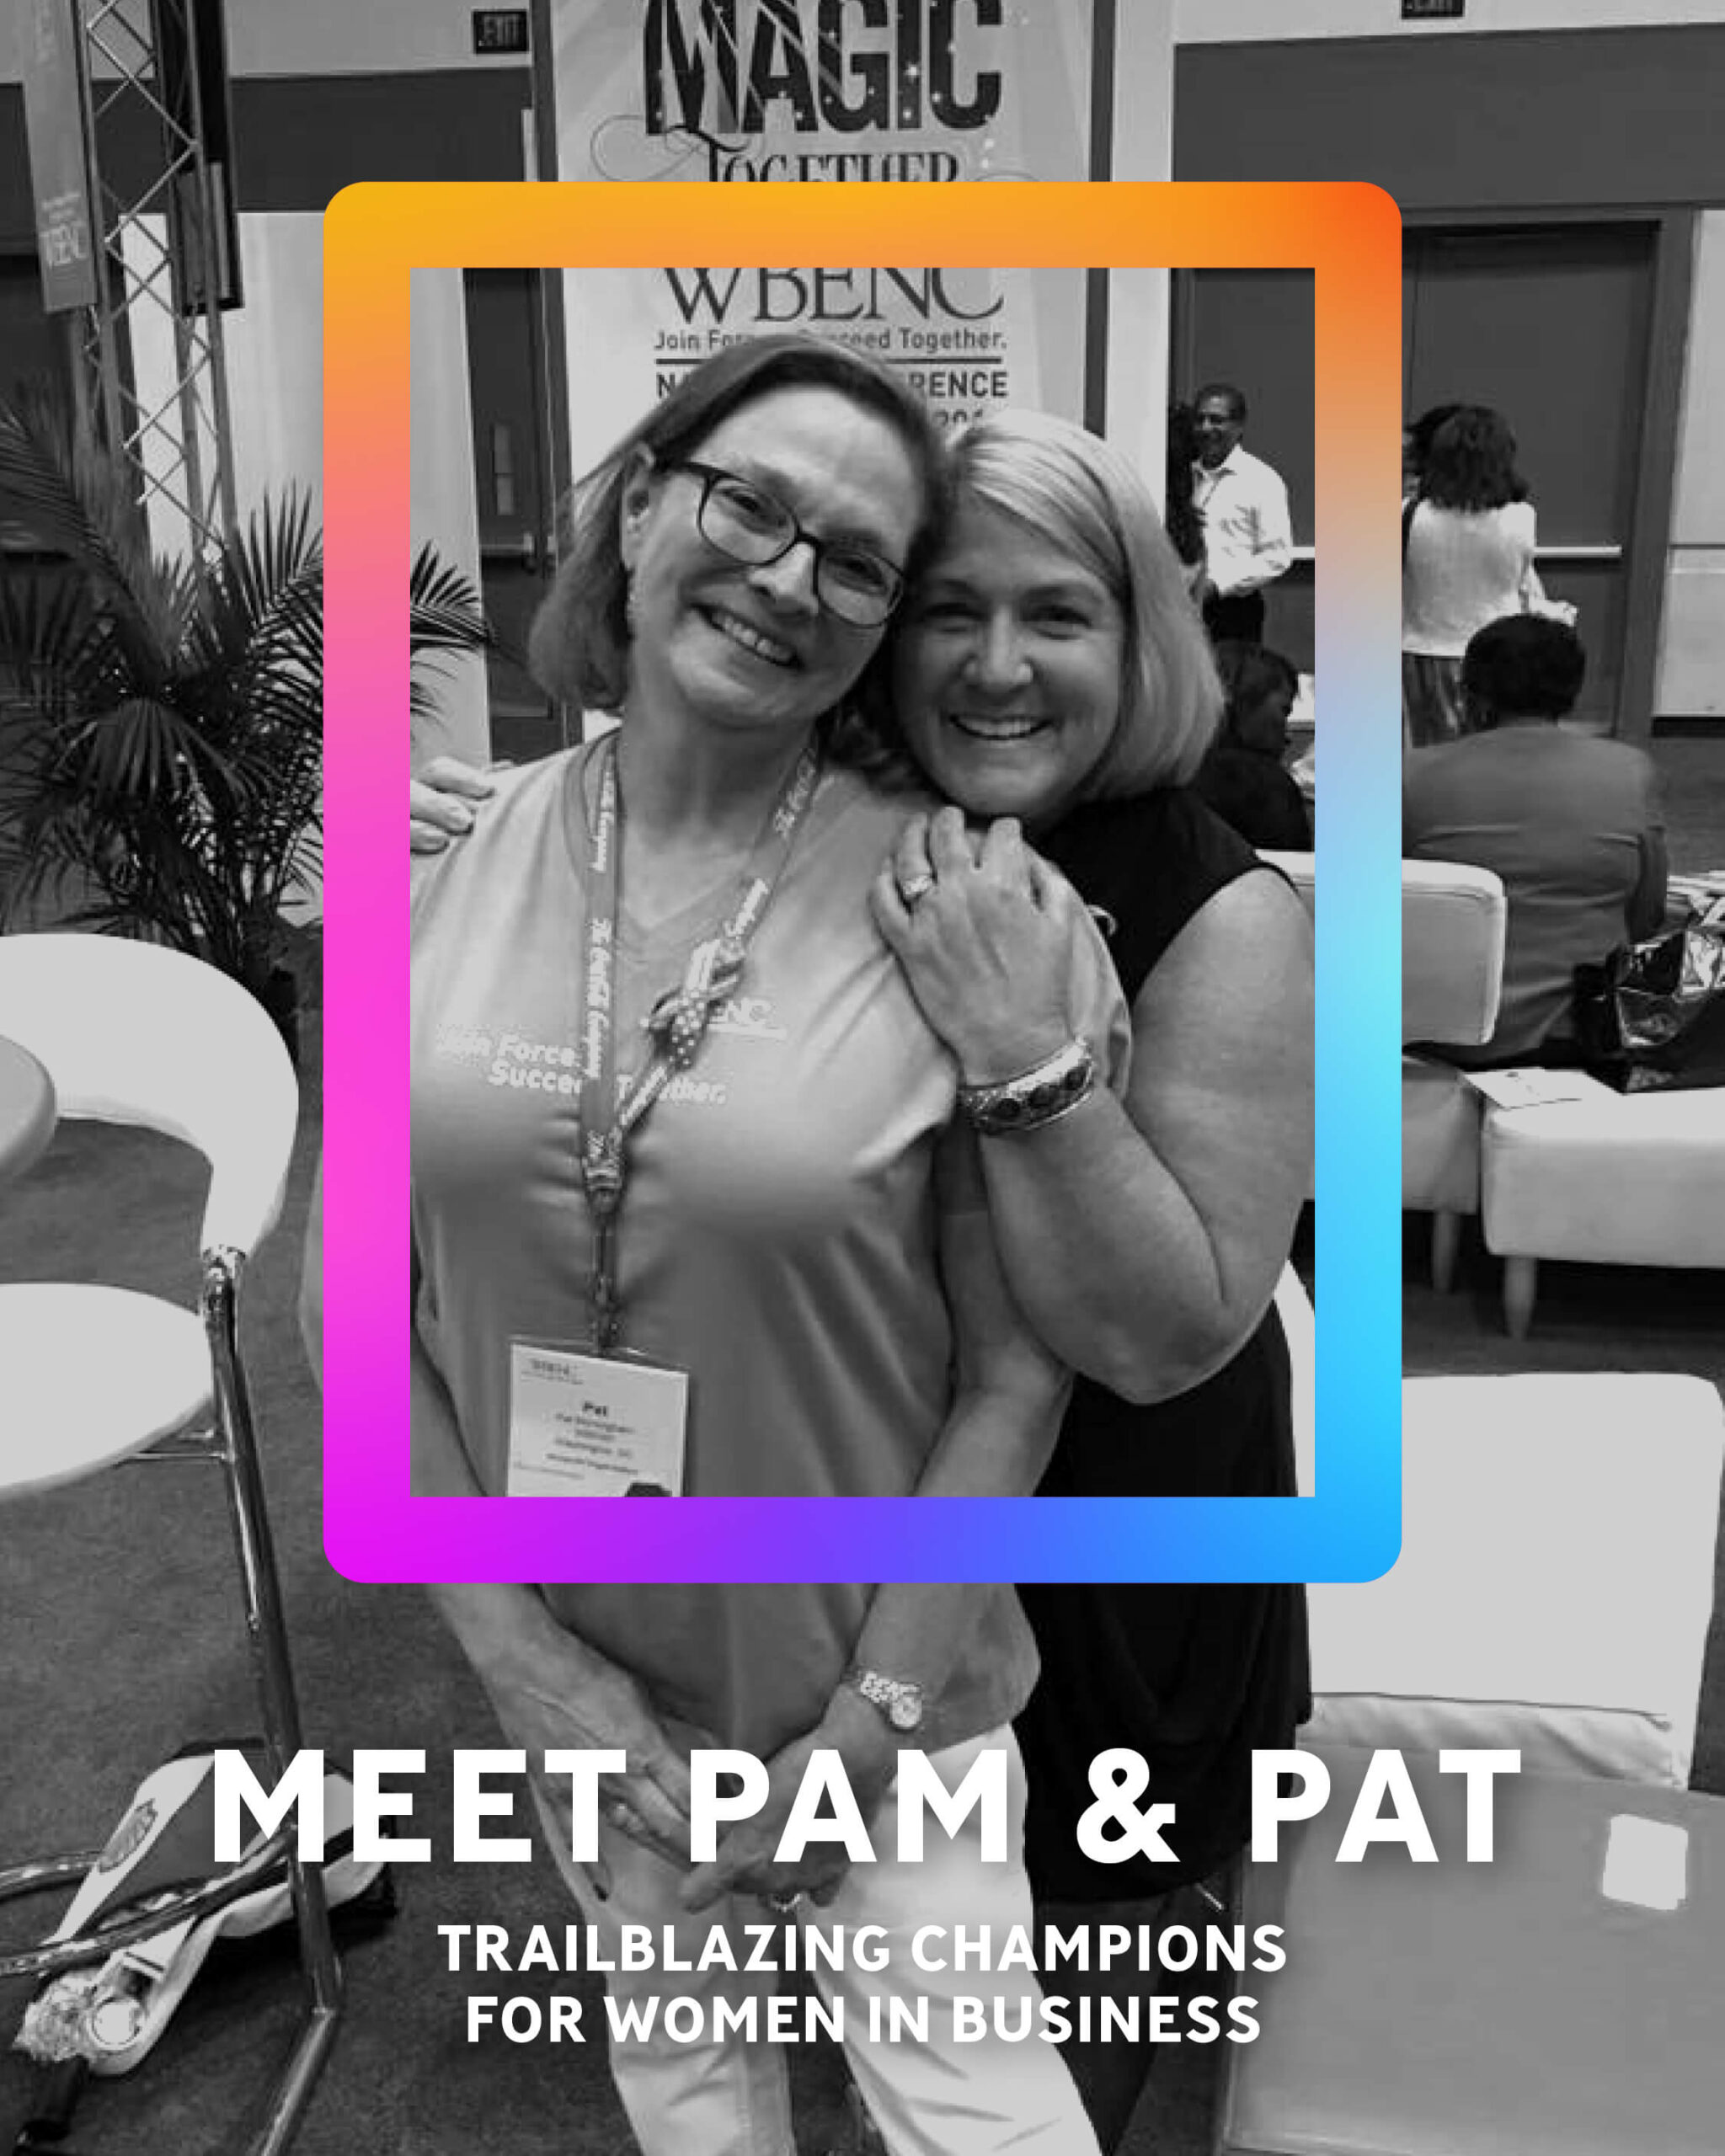 MIXX_25th_GrowthAgents_Social_Media_Pam-Pat_1